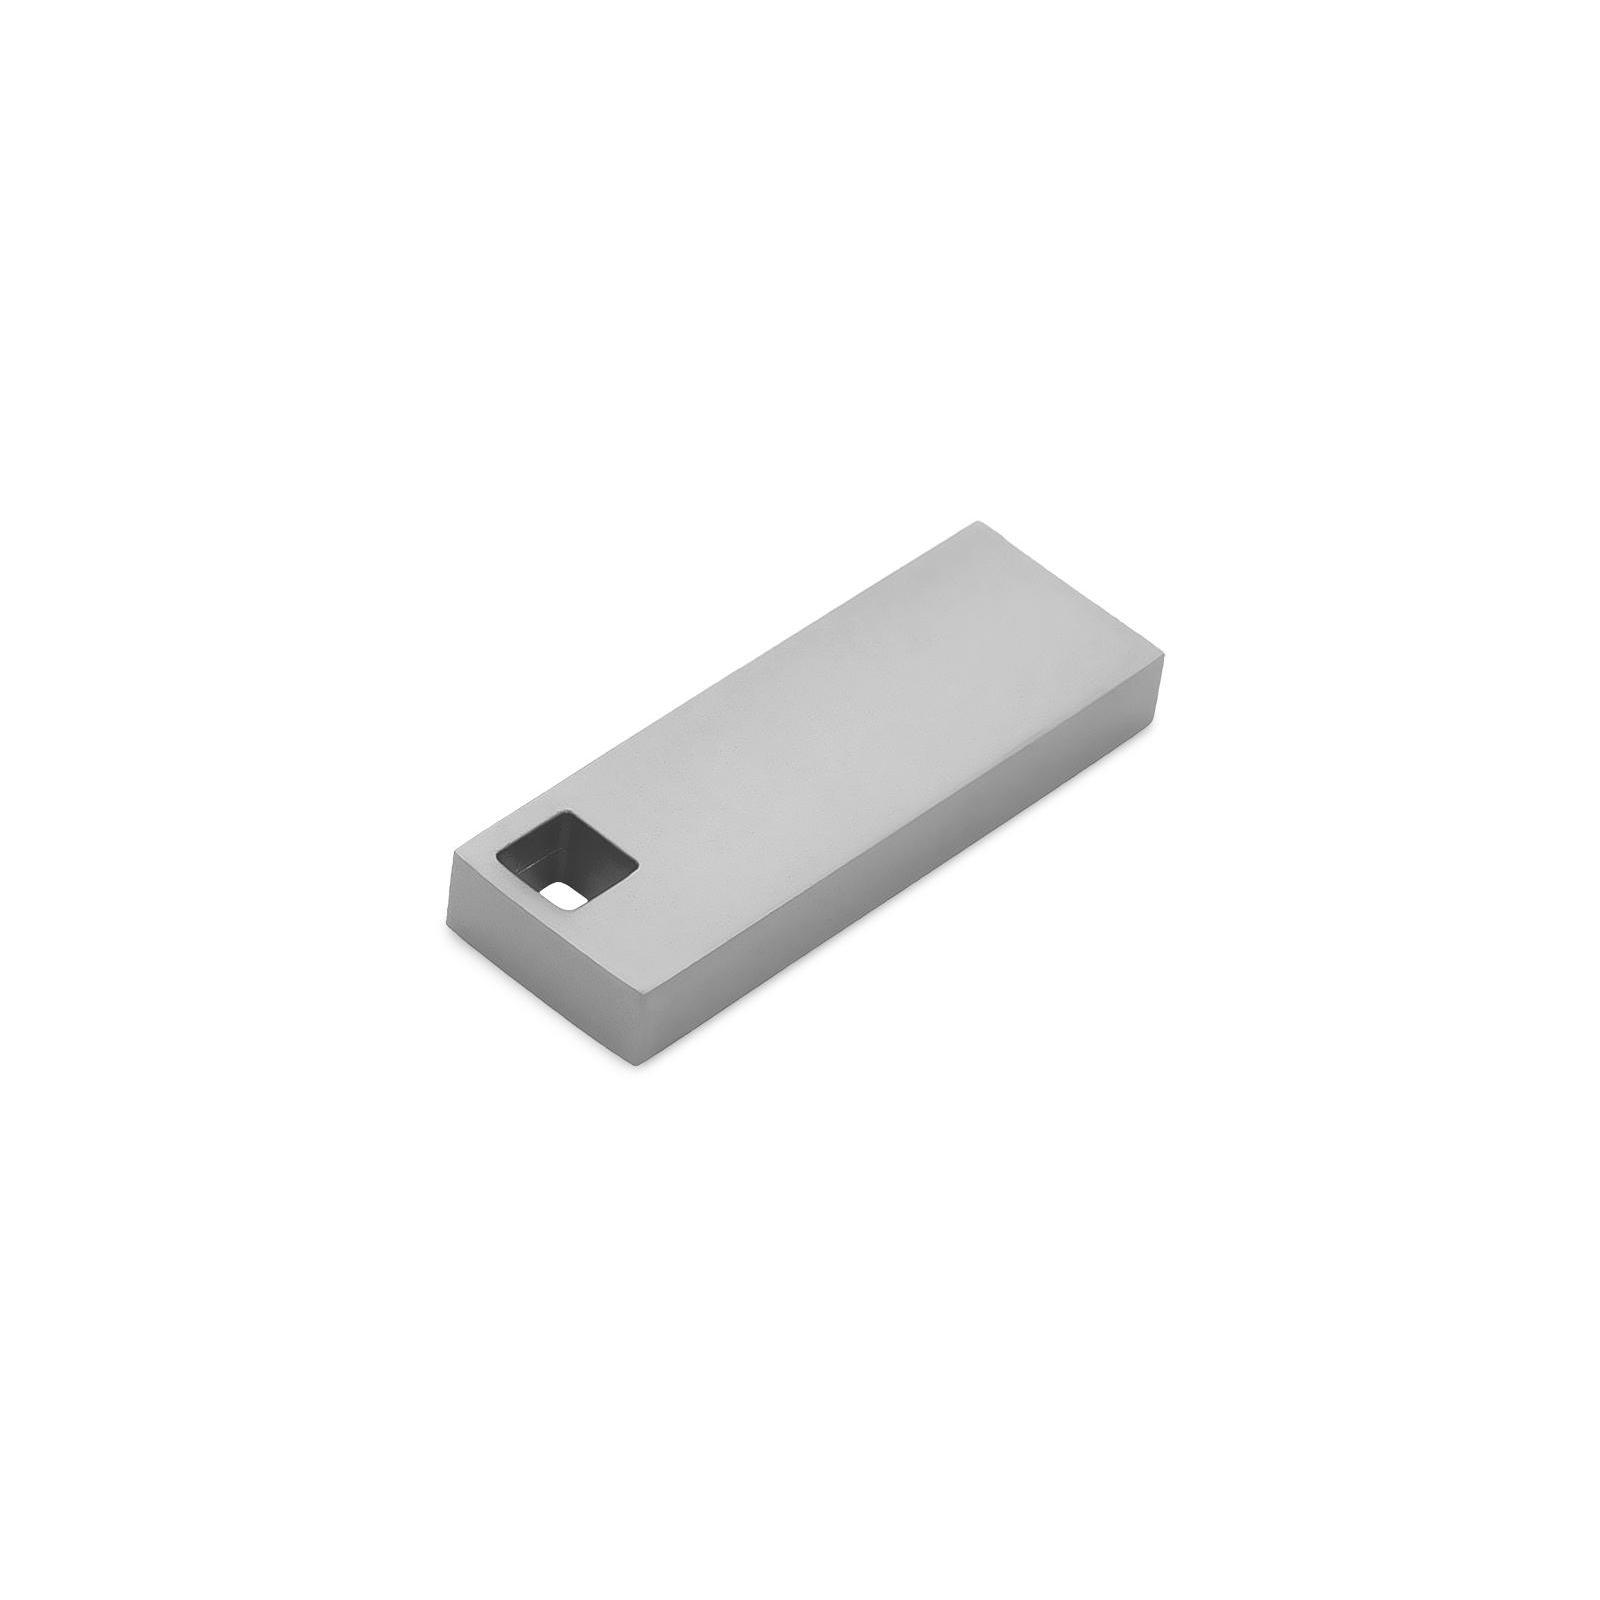 USB флеш накопитель eXceleram 128GB U1 SeriesSilver USB 3.1 Gen 1 (EXP2U3U1S128) изображение 3